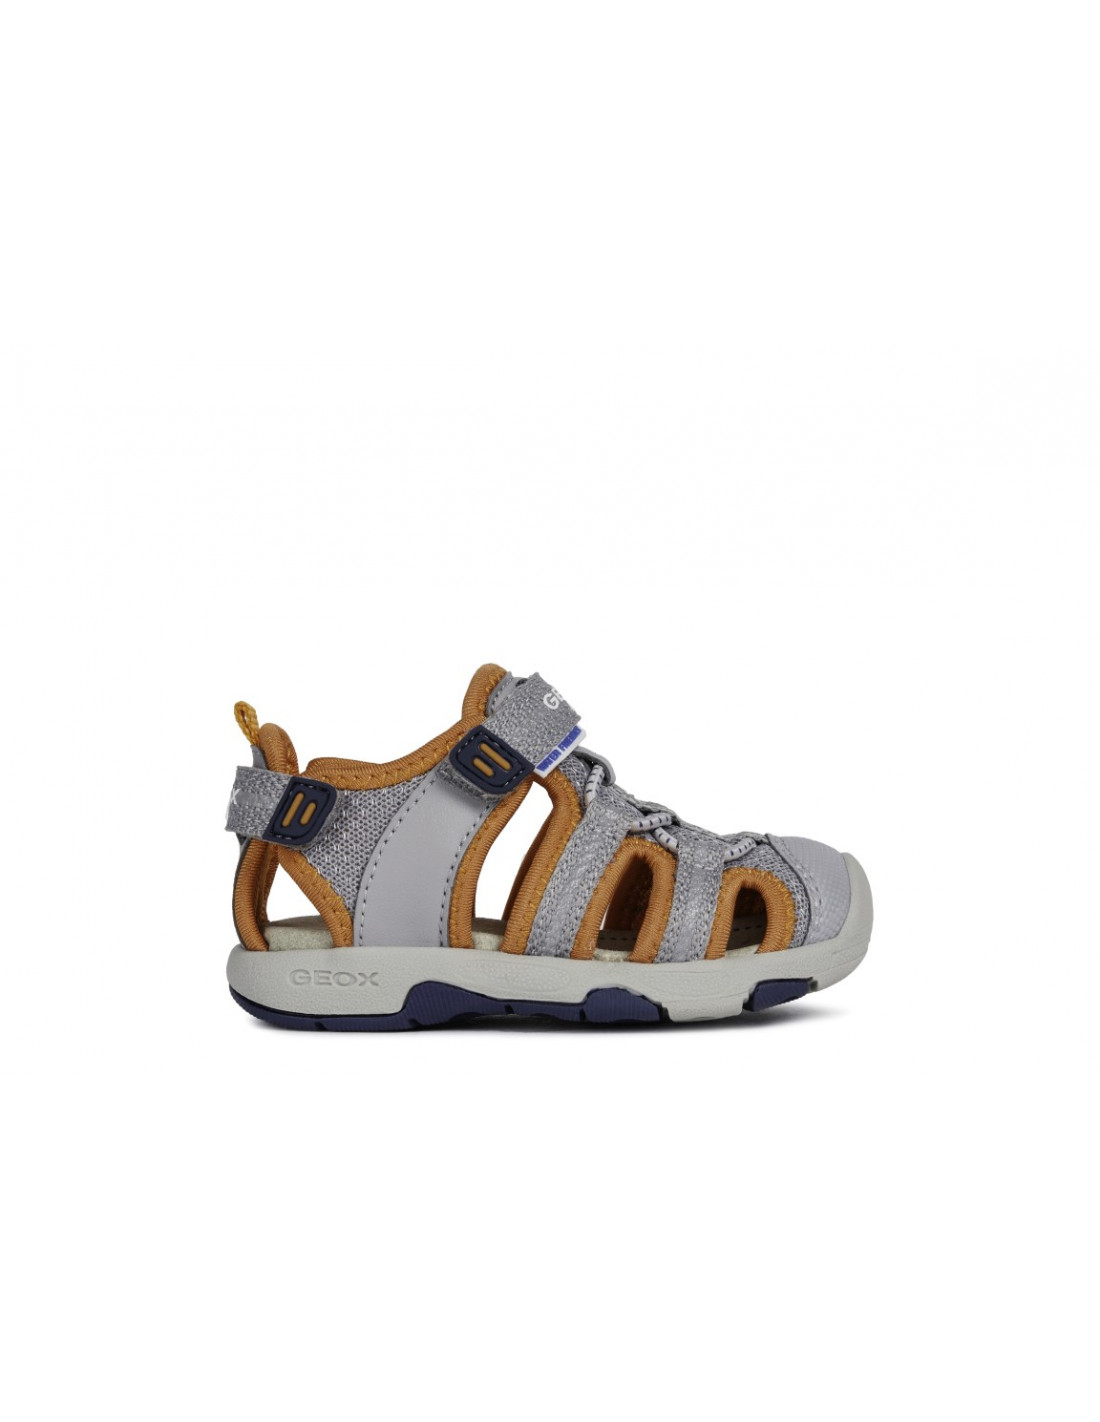 5aa2f2cd0 sandalia geox para niño transpirable flexible y amortiguada color gris